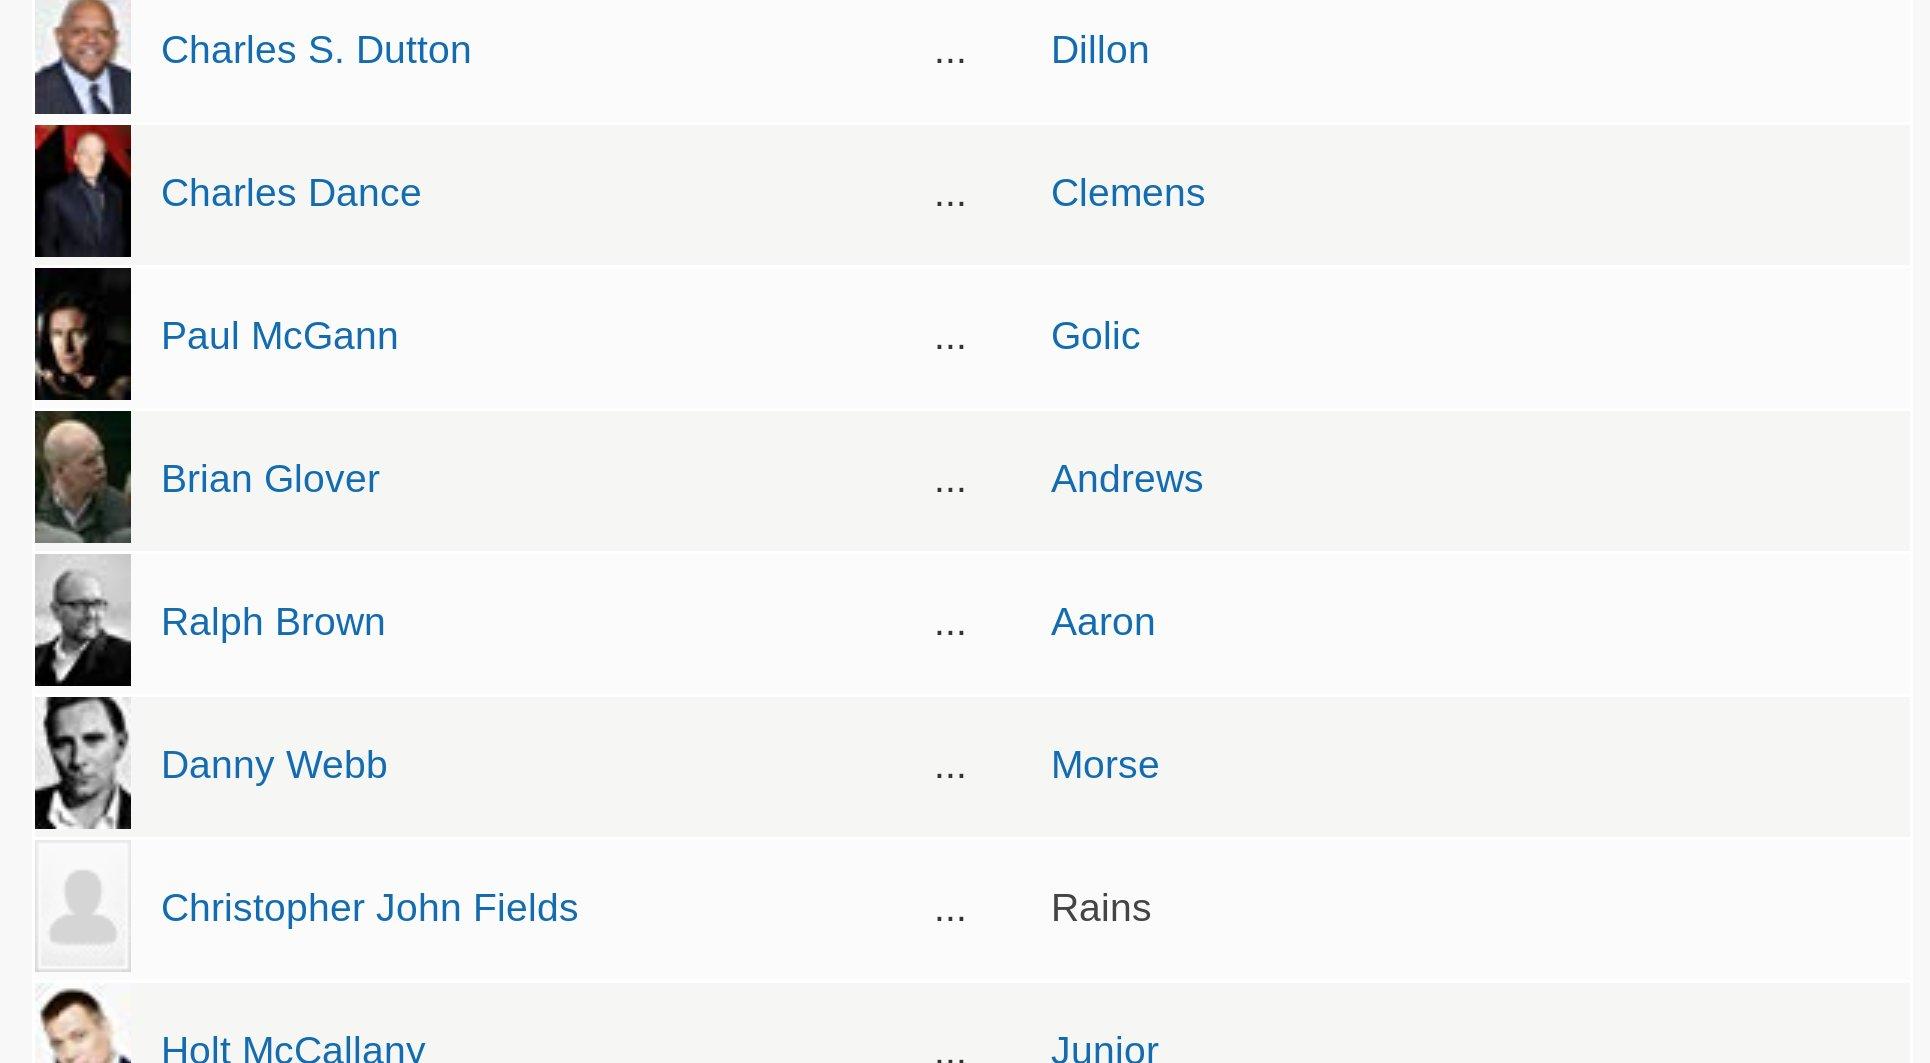 The impossible imdb